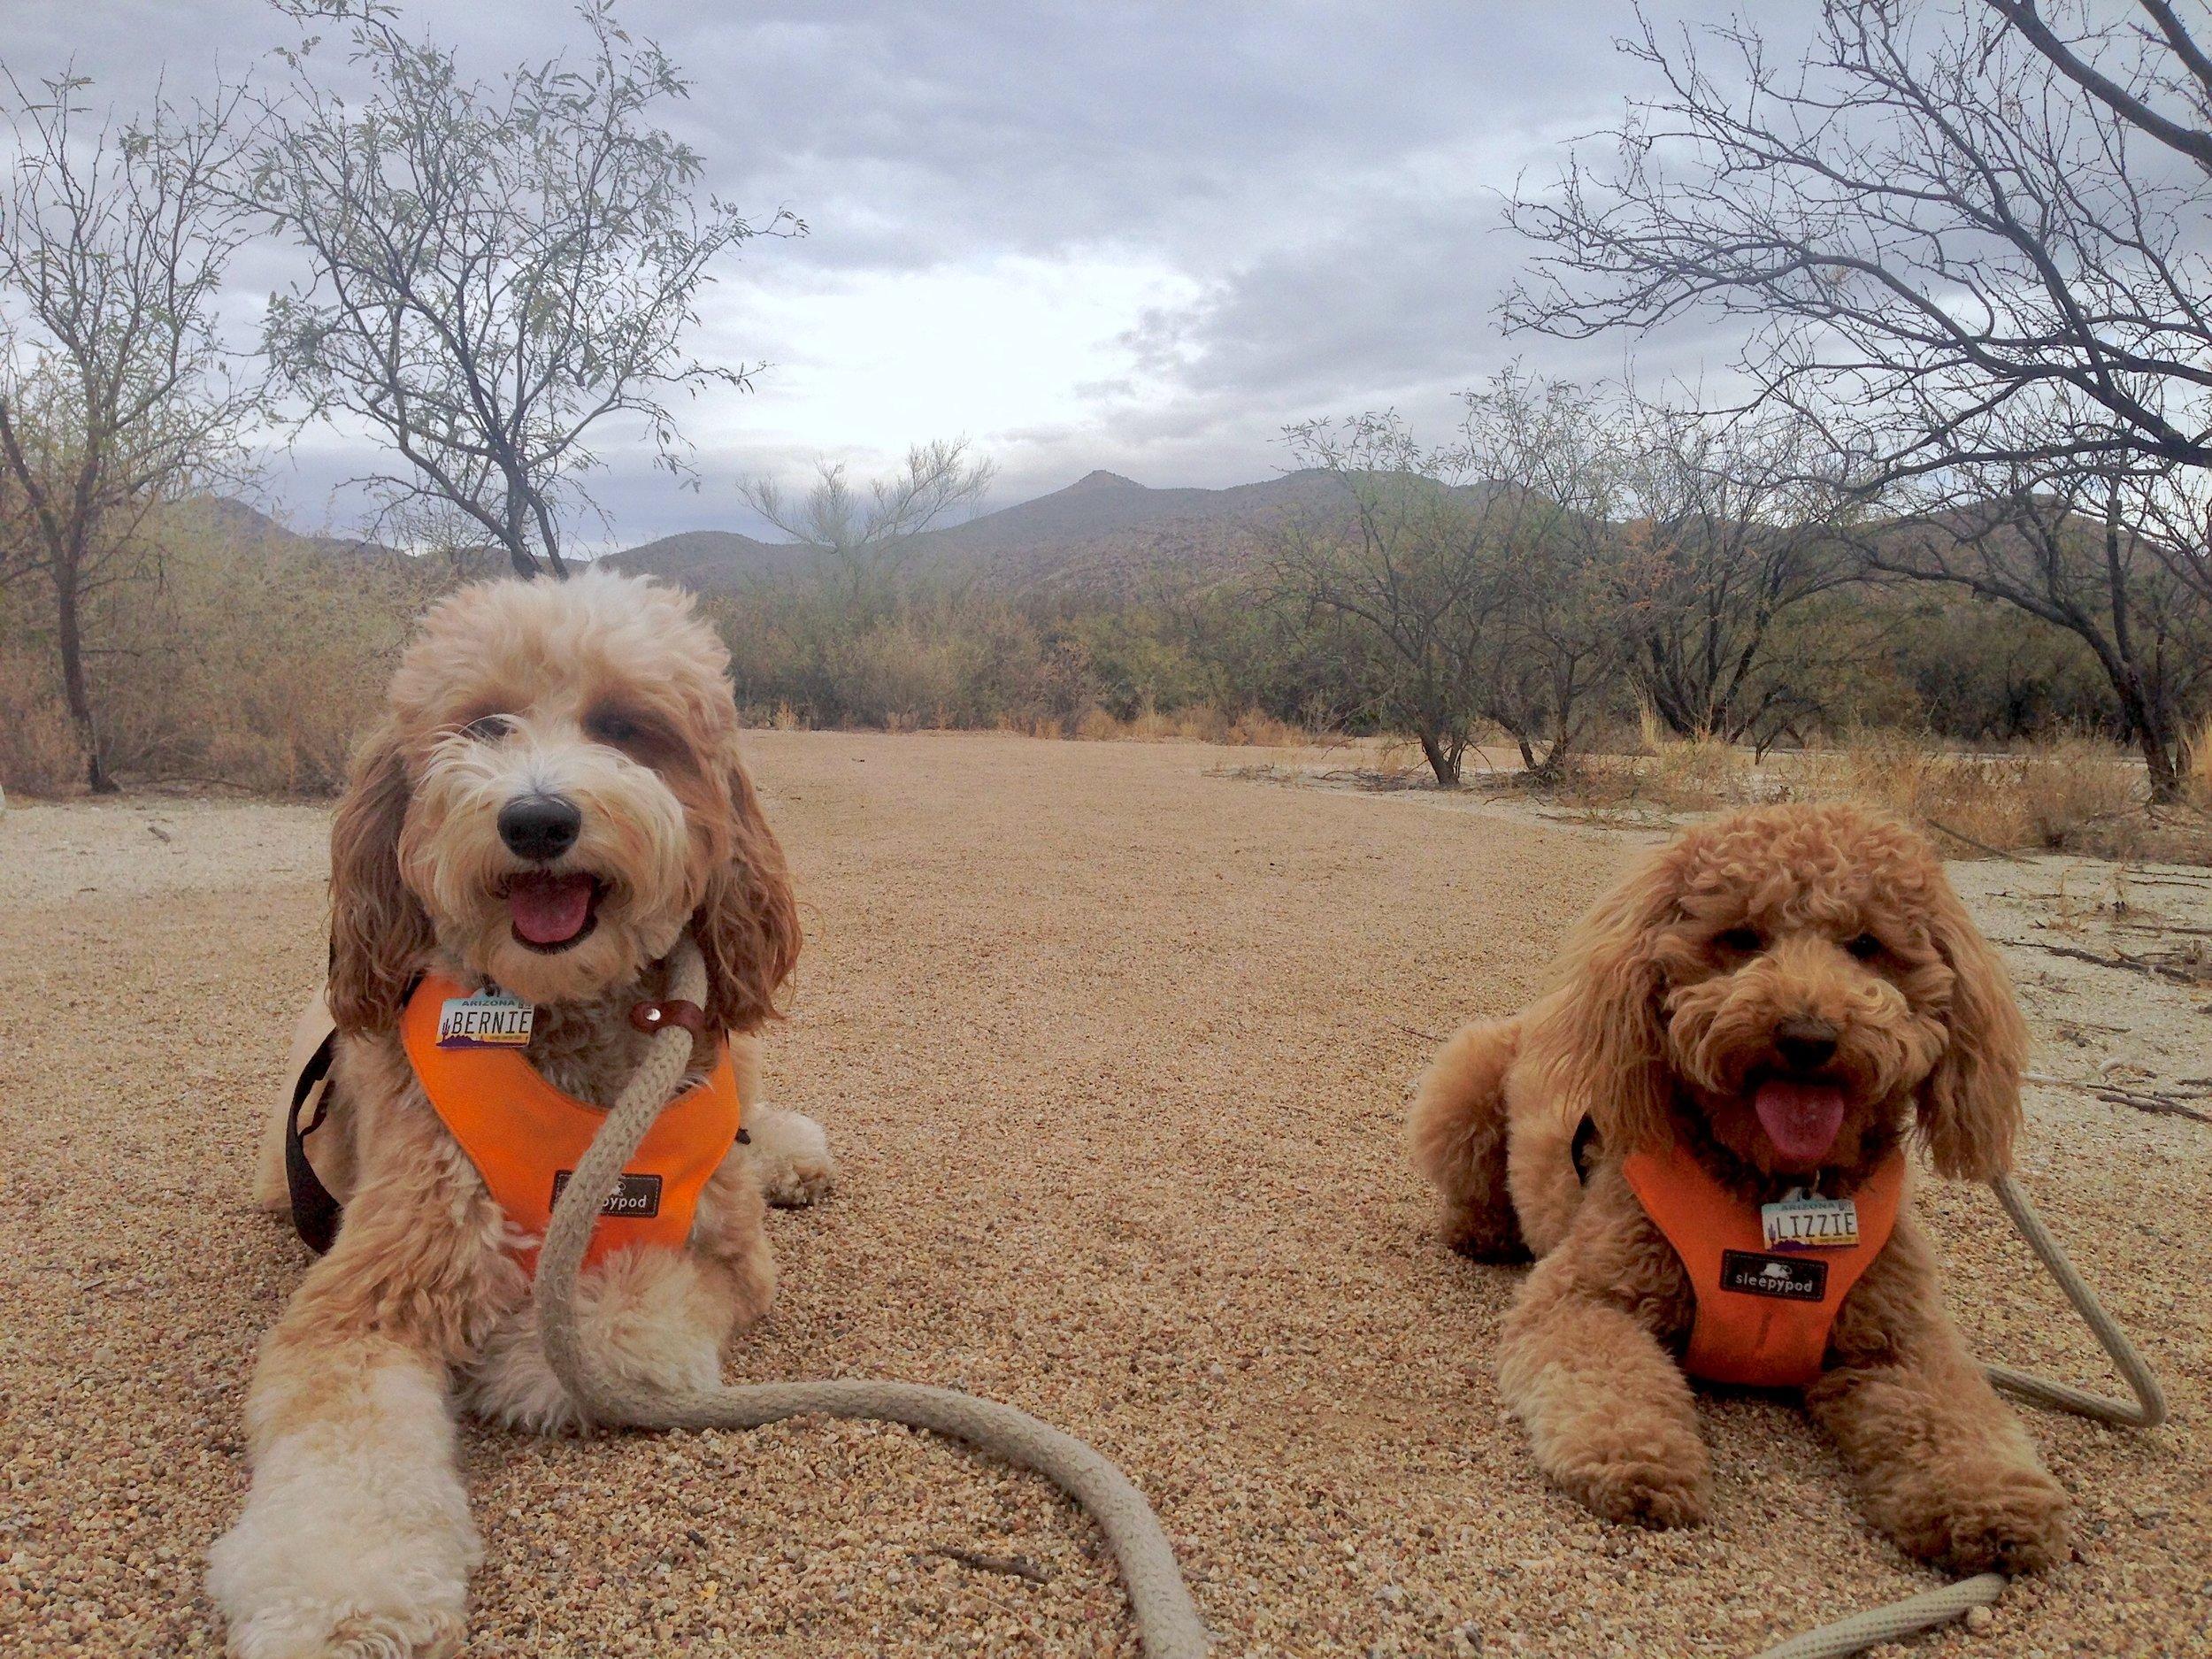 Bernie and Lizzie McSquare resting at Agua Client Park in Tucson, Arizona.